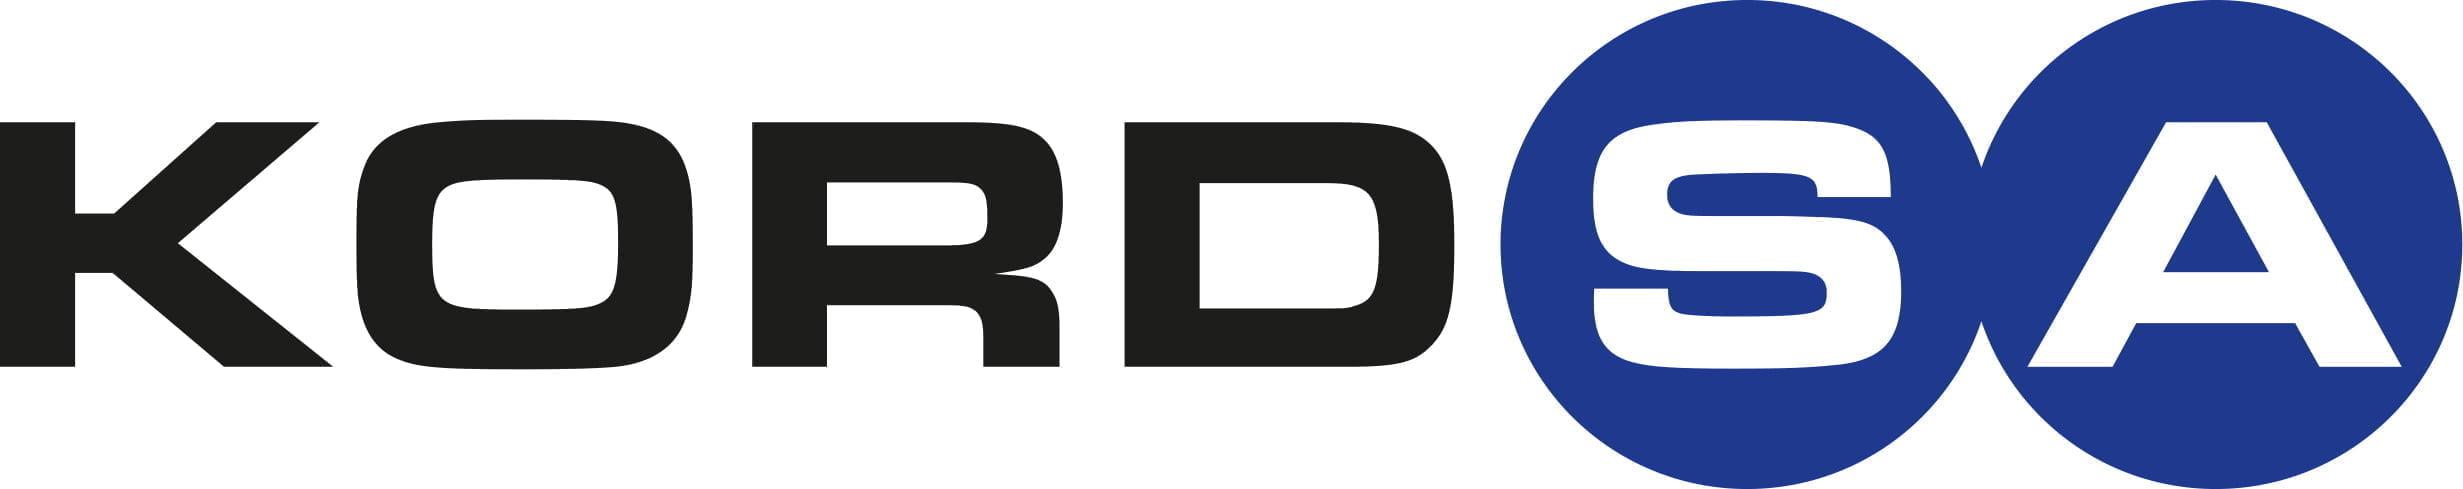 1487664862_Kordsa_Logo